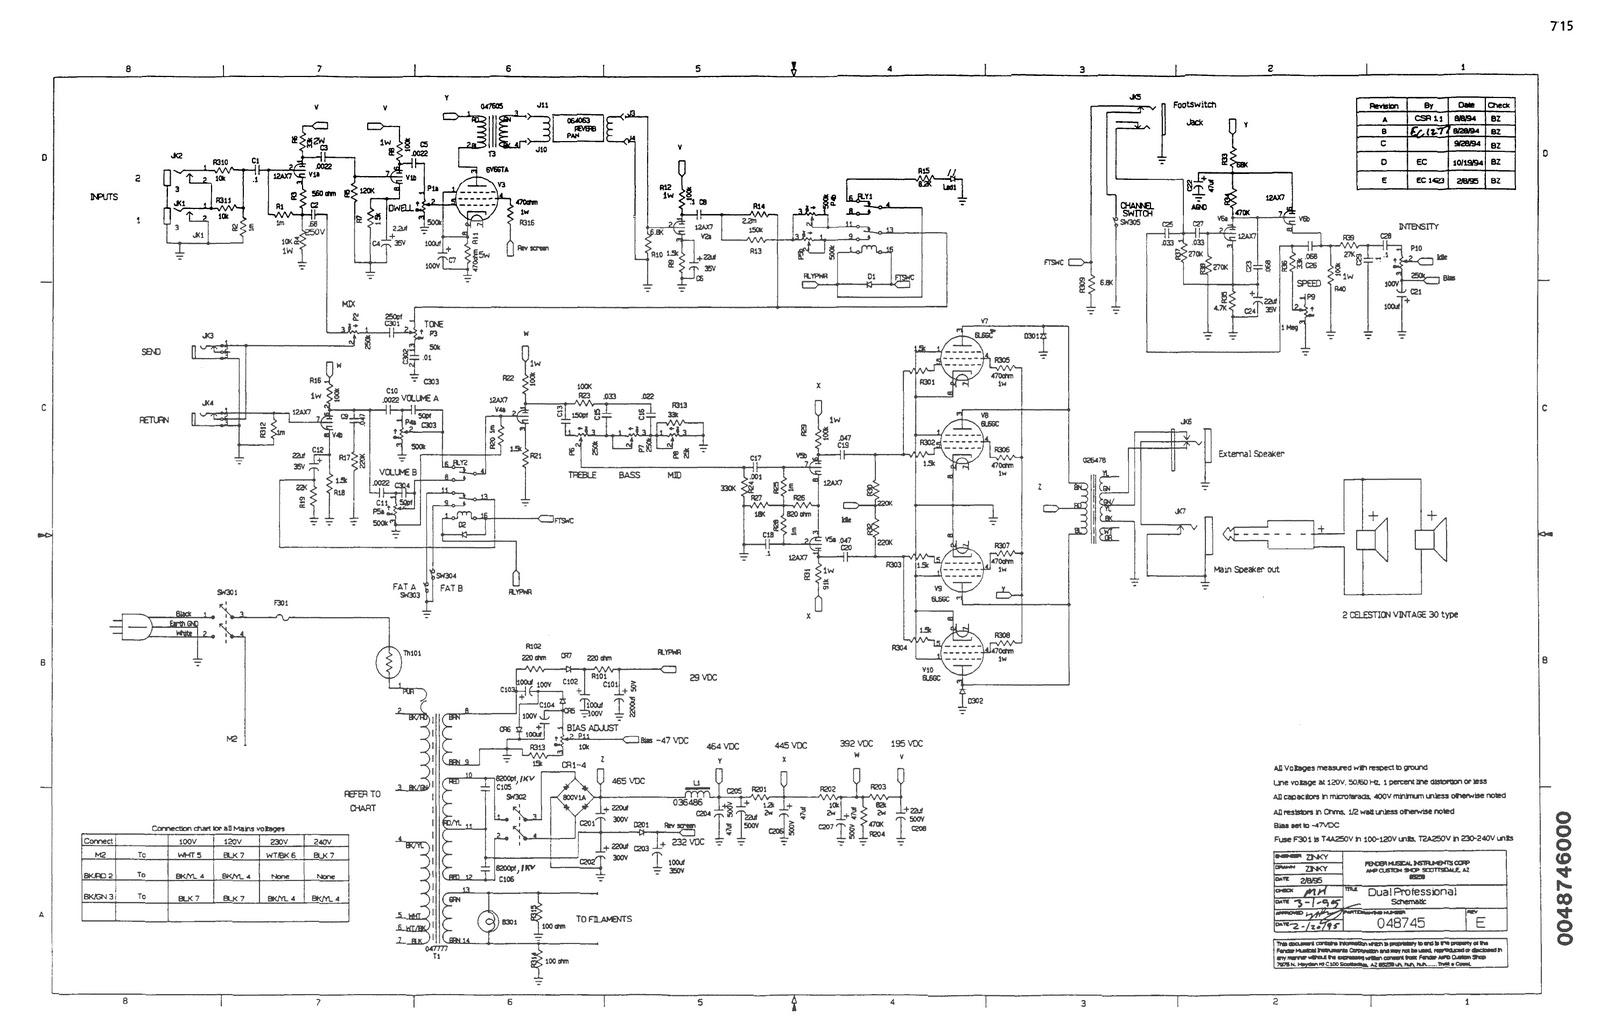 fender tone-master / vibro-king / dual pro circuits